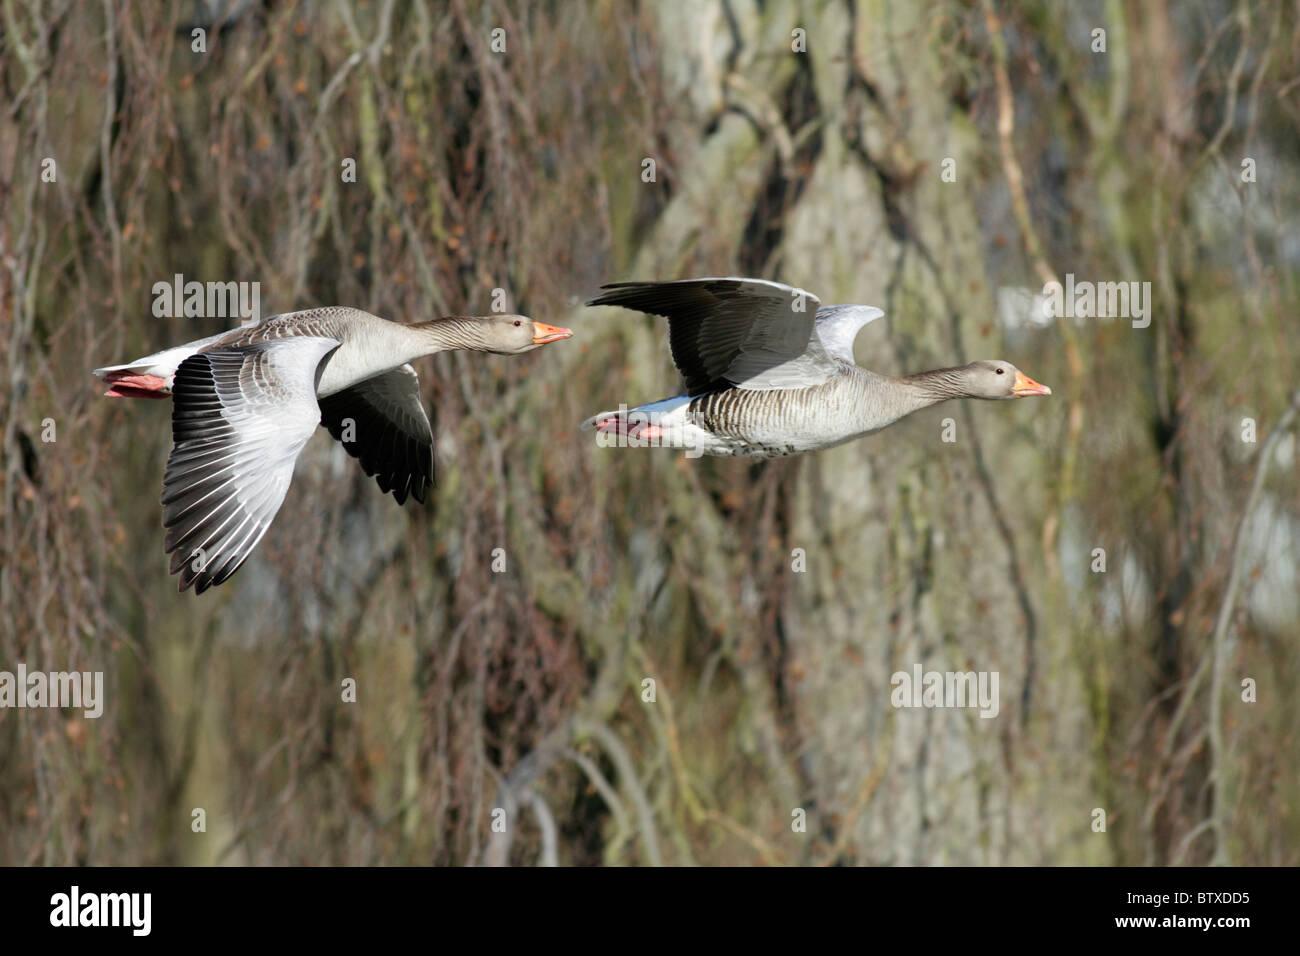 Greylag Goose (Anser anser), to birds in flight, Germany Stock Photo